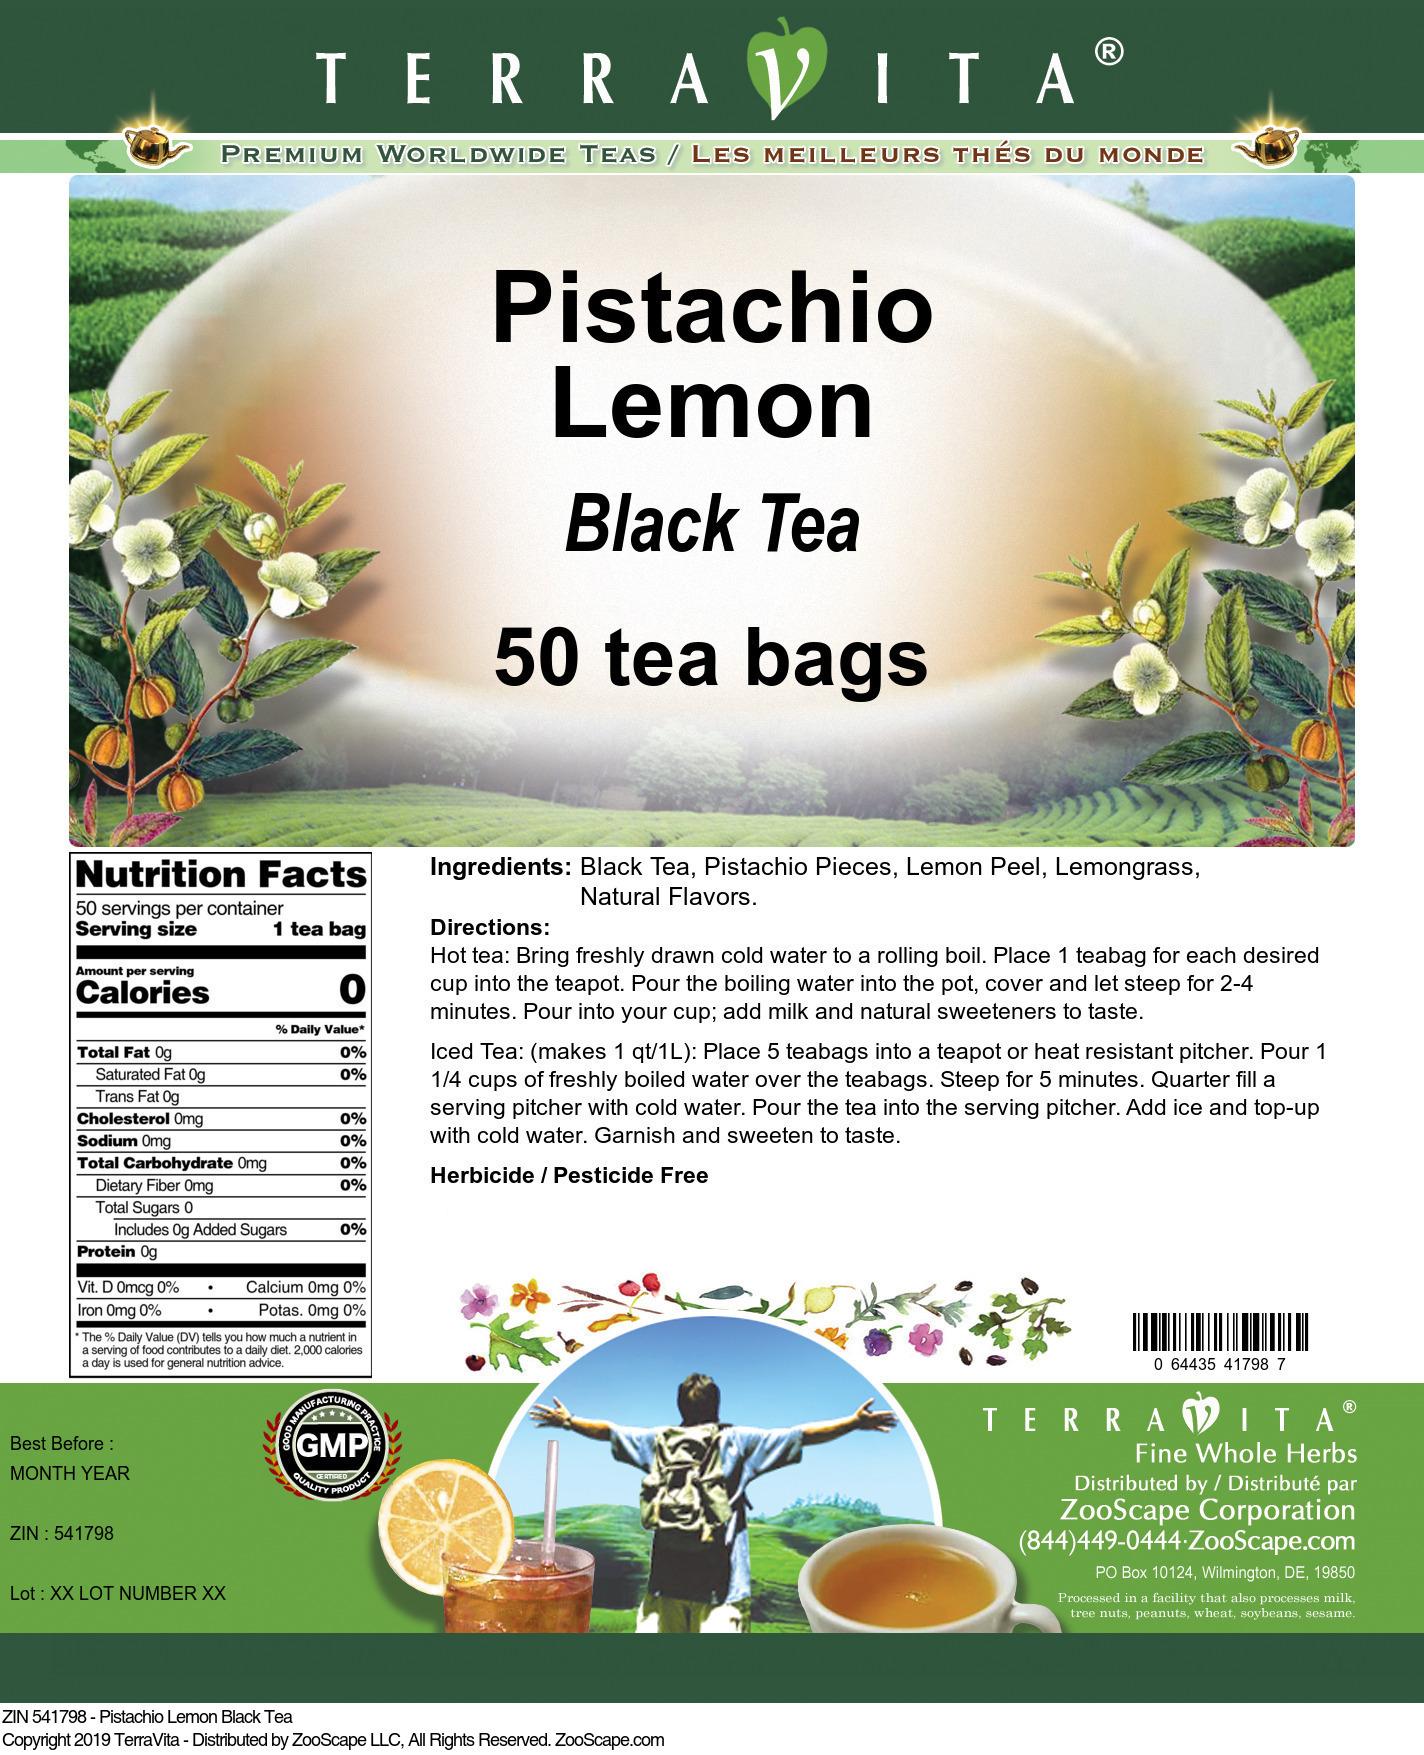 Pistachio Lemon Black Tea